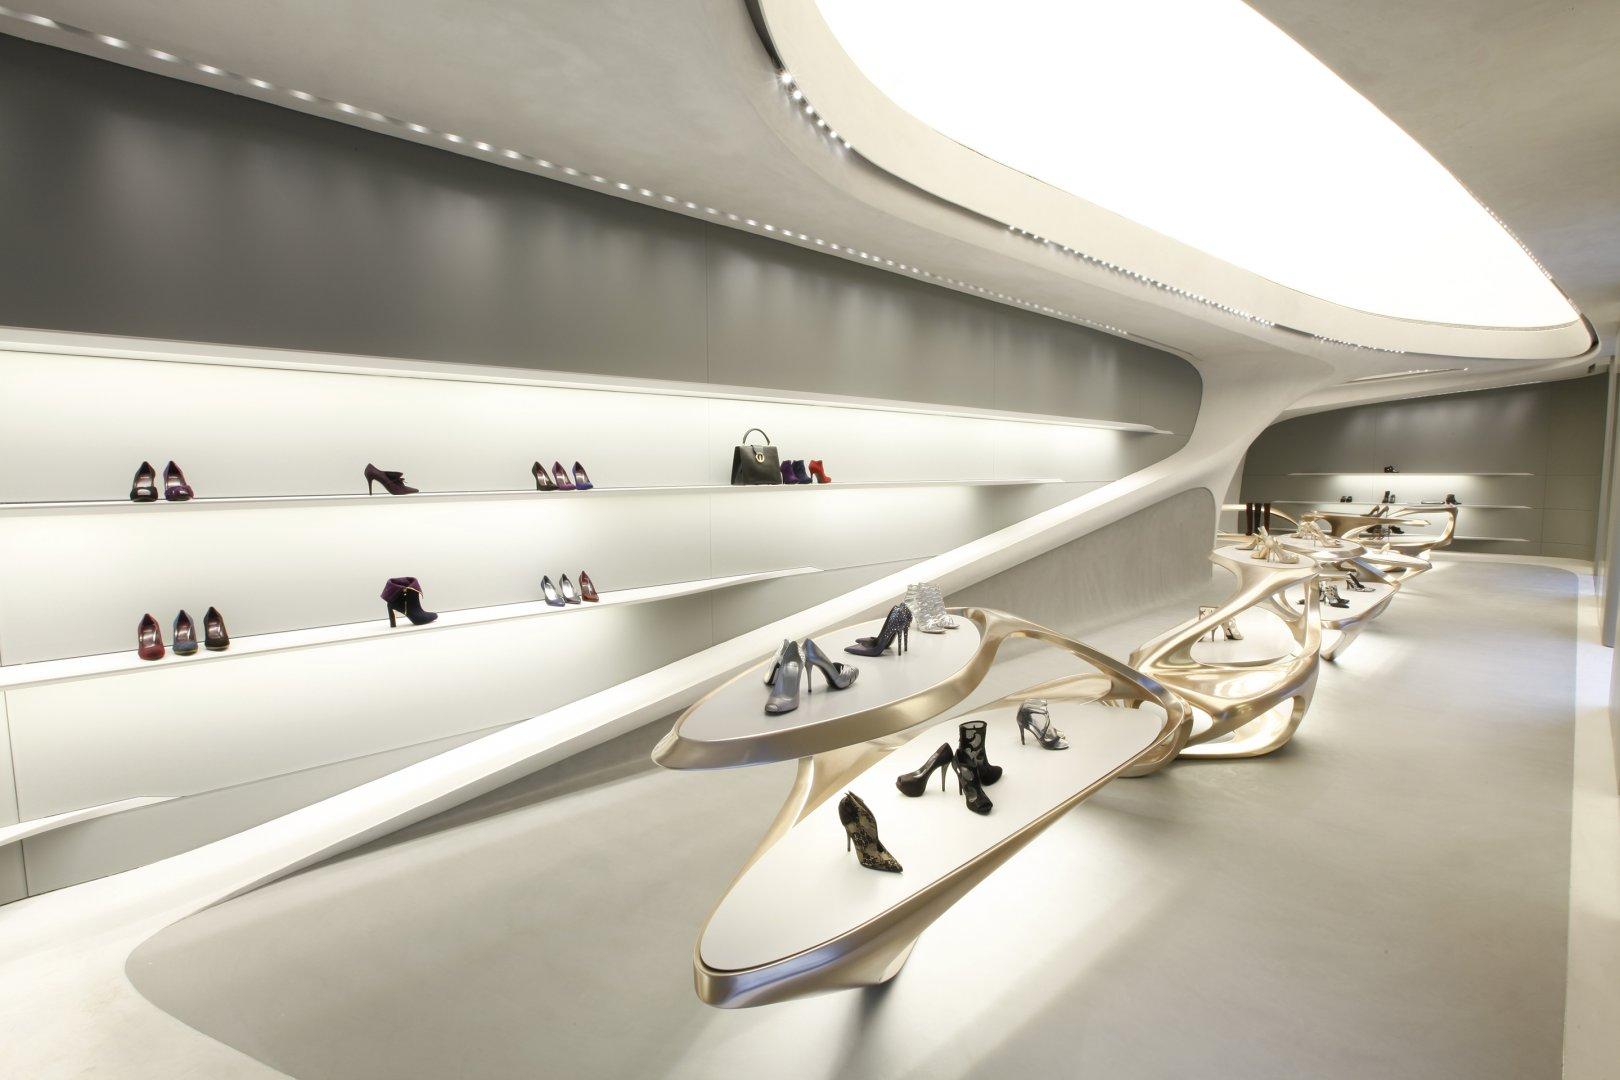 Stuart Weitzman Flagship Store in Milan